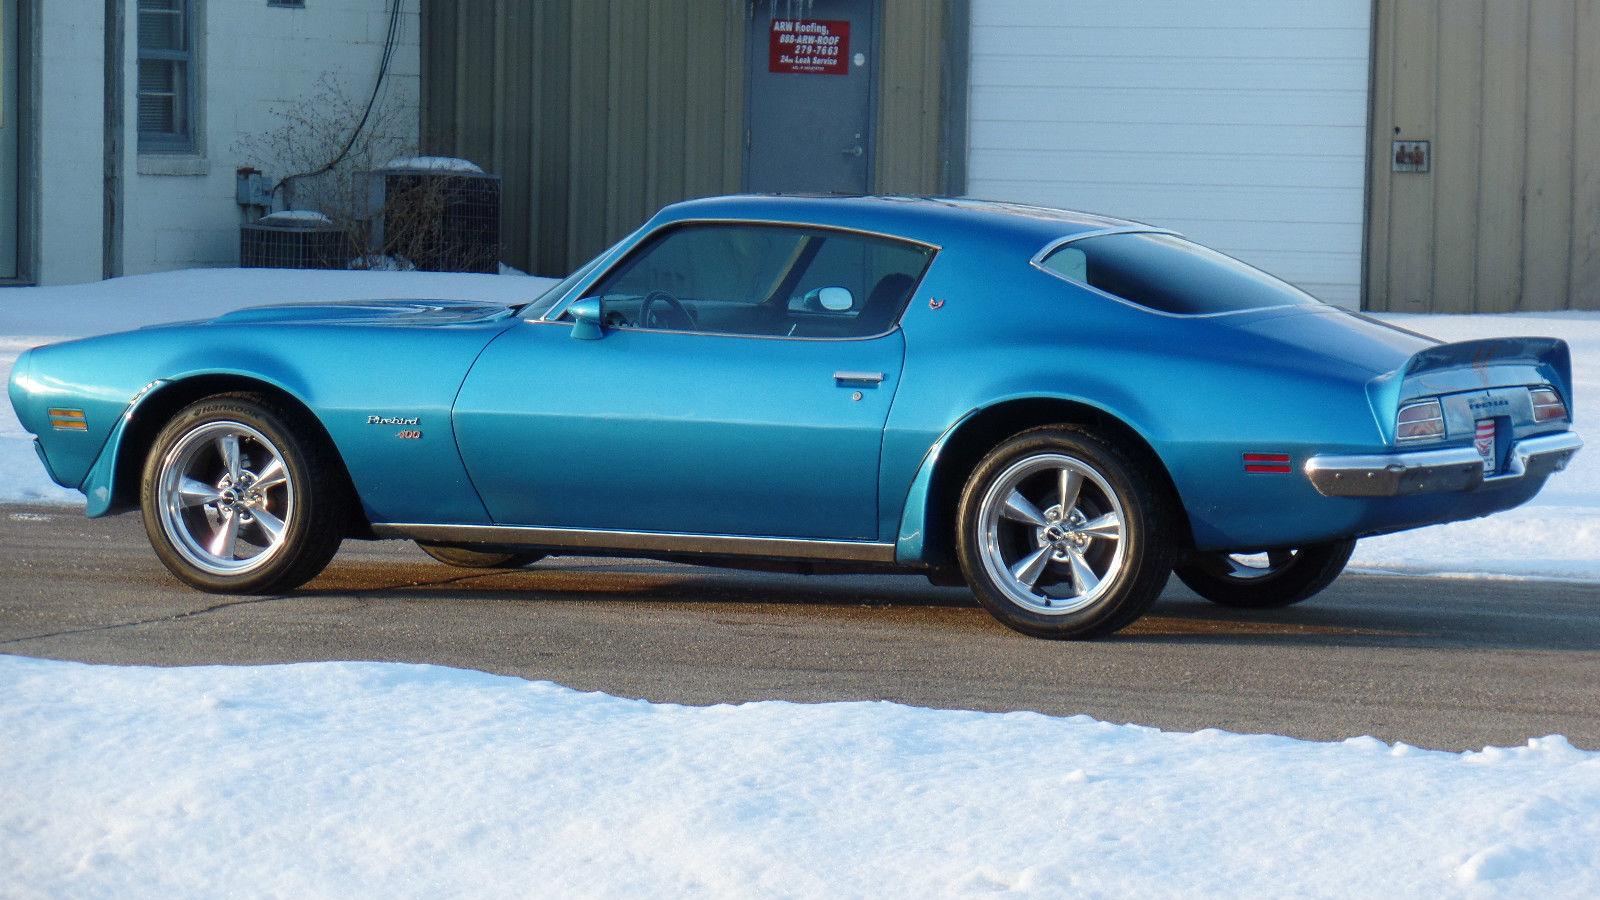 1970 pontiac firebird formula 400 lucerne blue rust free bird over 400hp classic pontiac. Black Bedroom Furniture Sets. Home Design Ideas